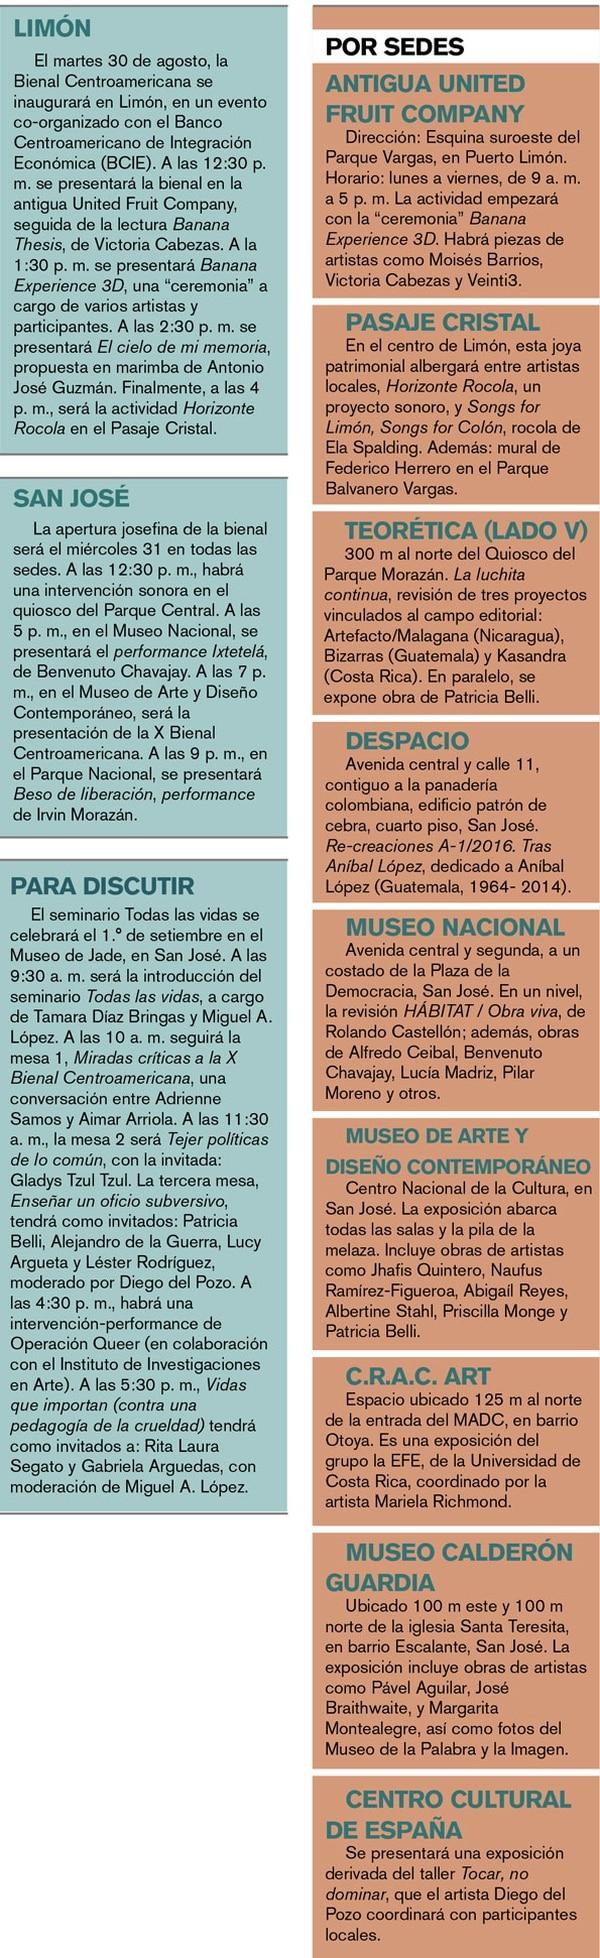 Bienal Centroamericana